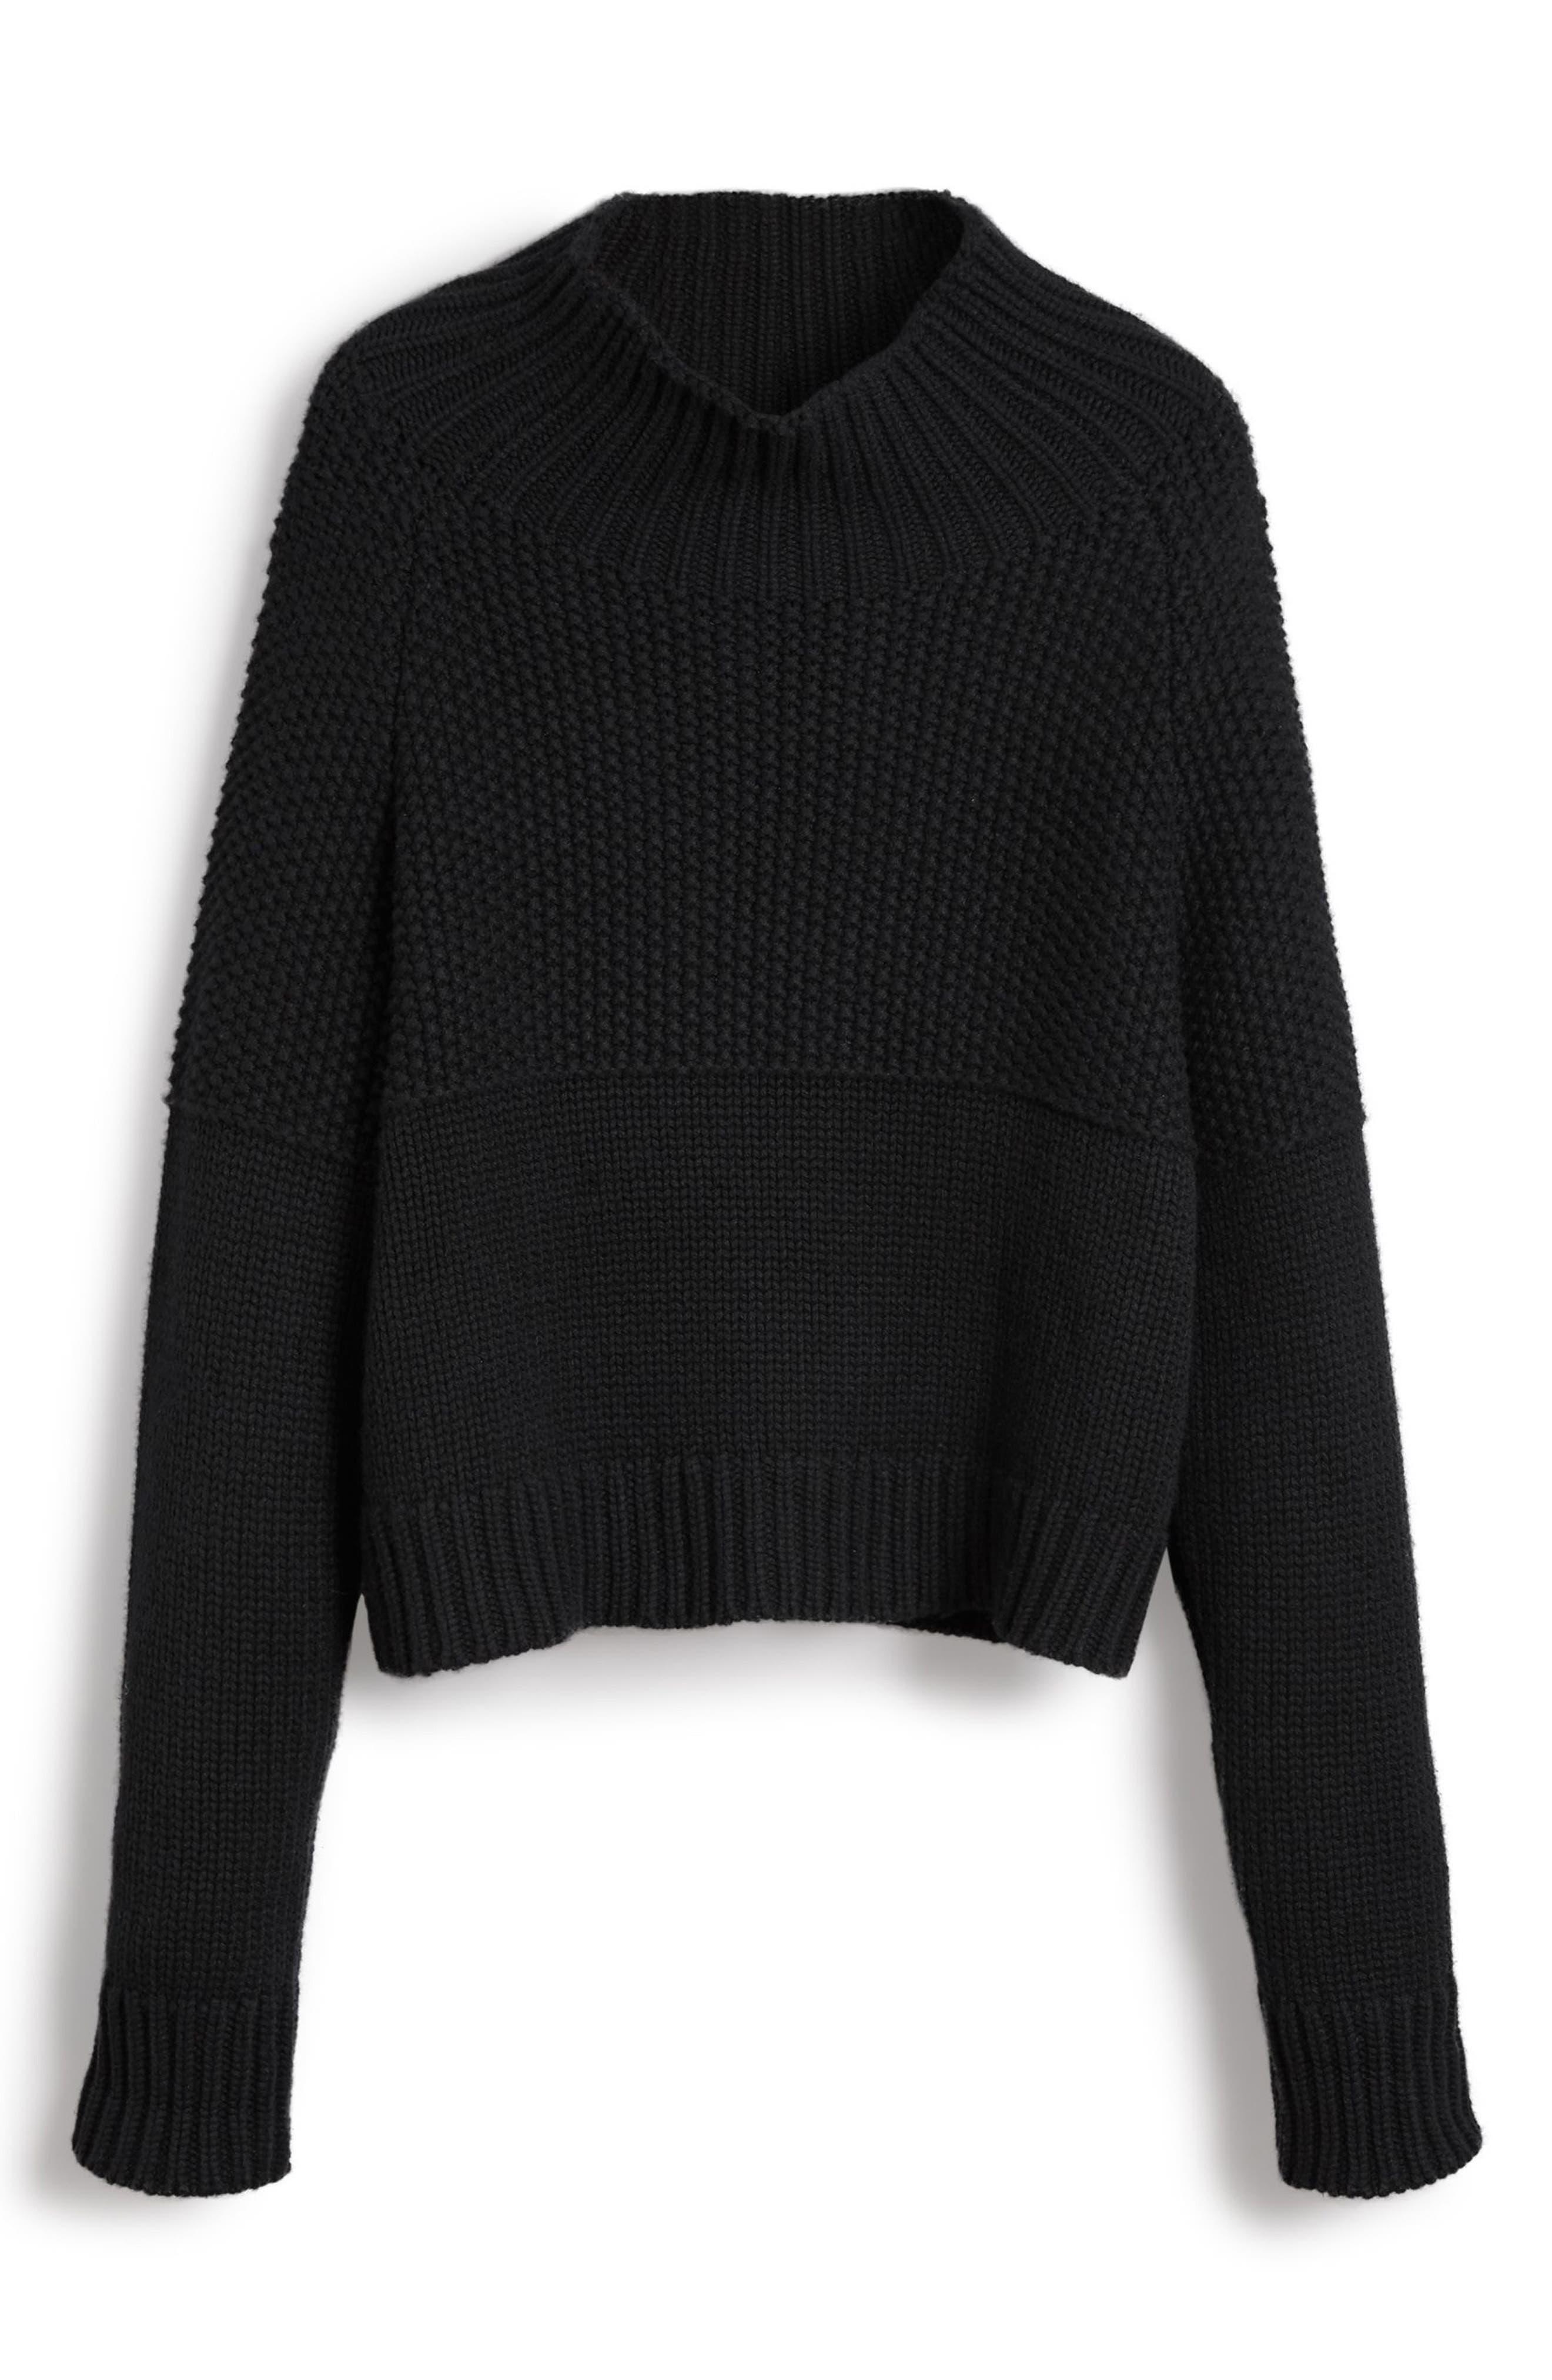 Dawson Cashmere Sweater,                             Alternate thumbnail 4, color,                             001